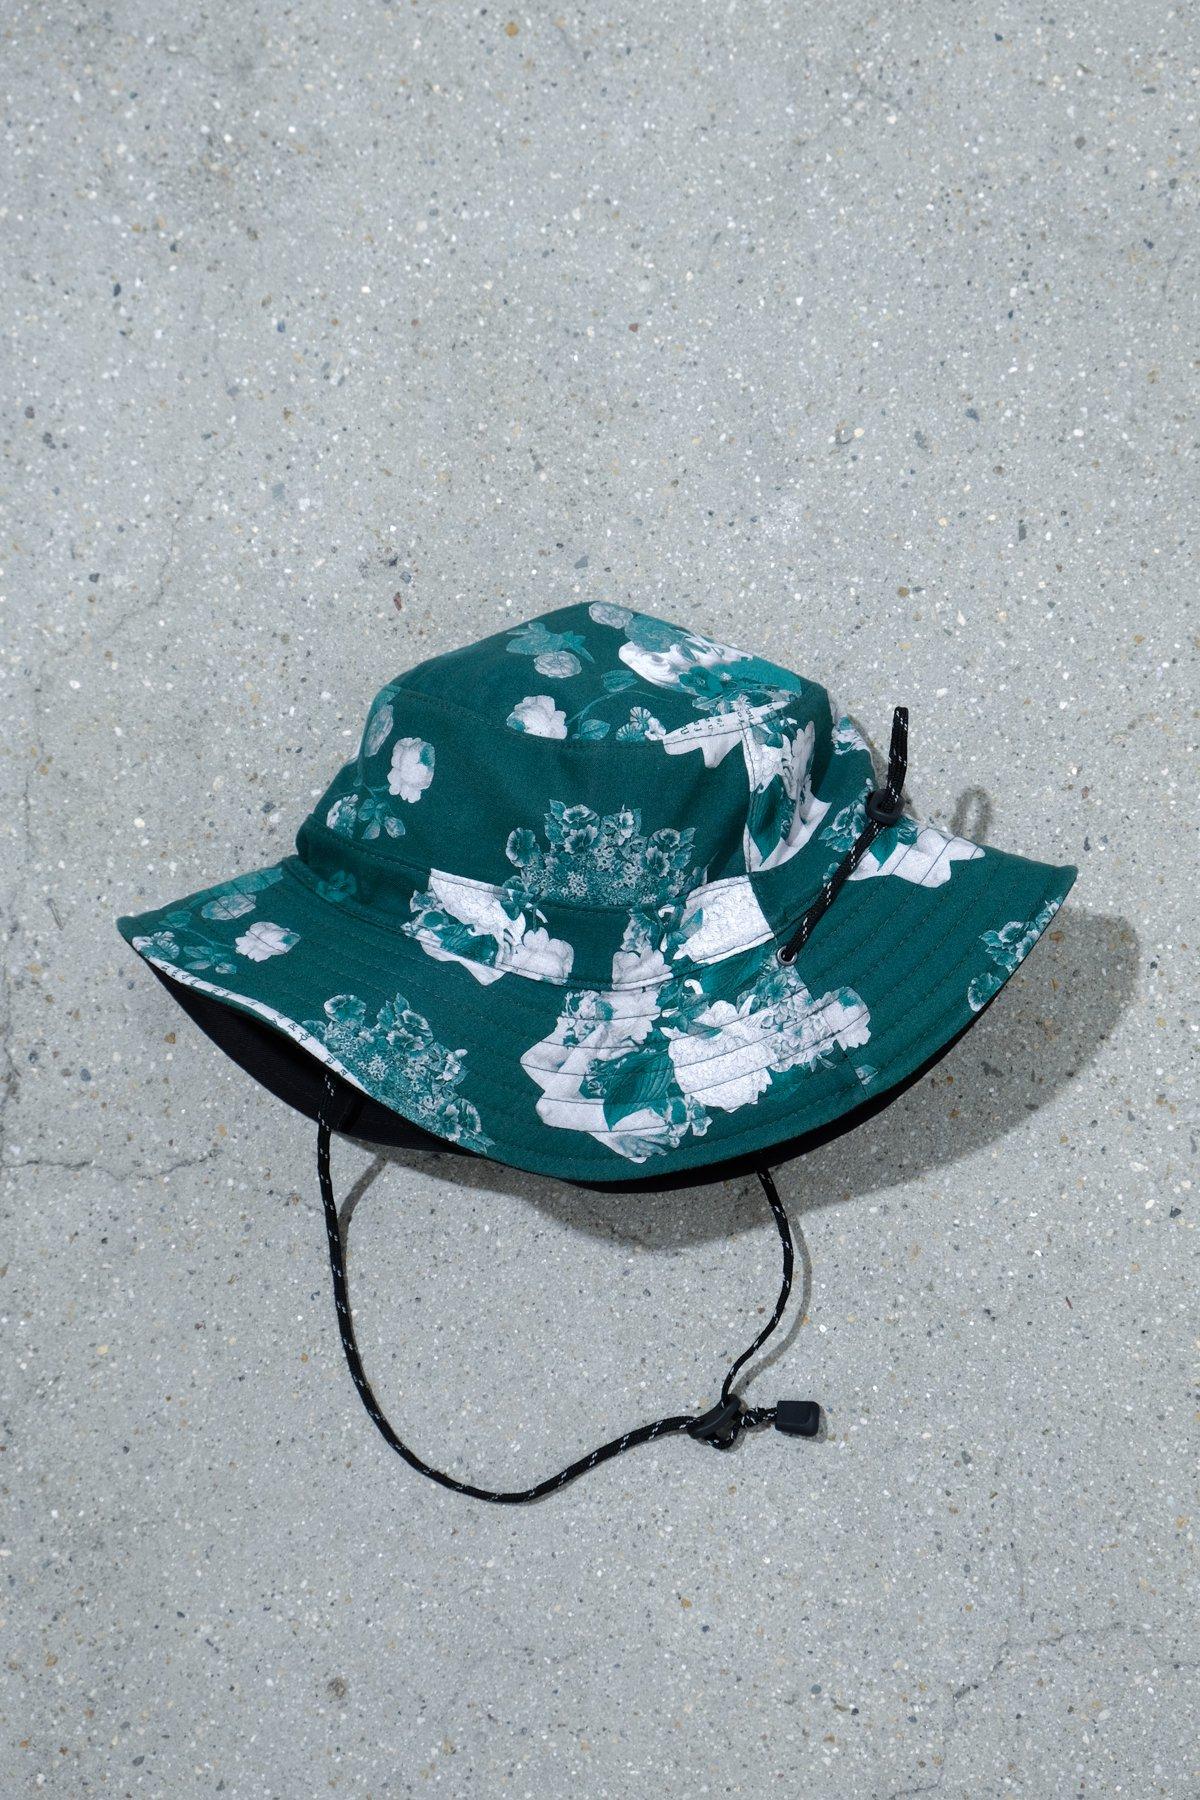 MIYAGI HIDETAKA × Tion / HAT